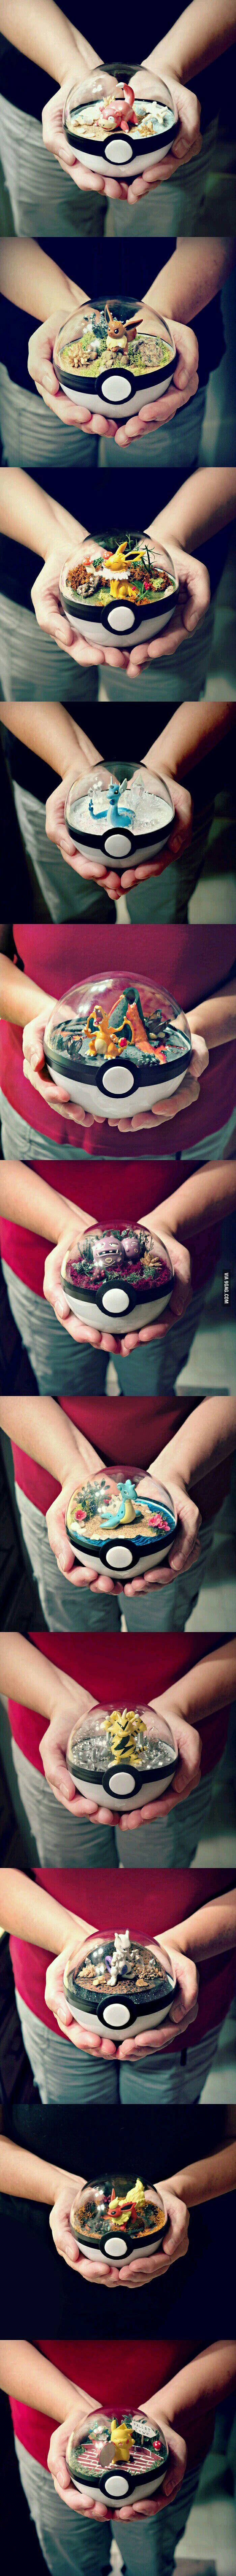 Pokemon Terrarium. You know you want it http://ibeebz.com